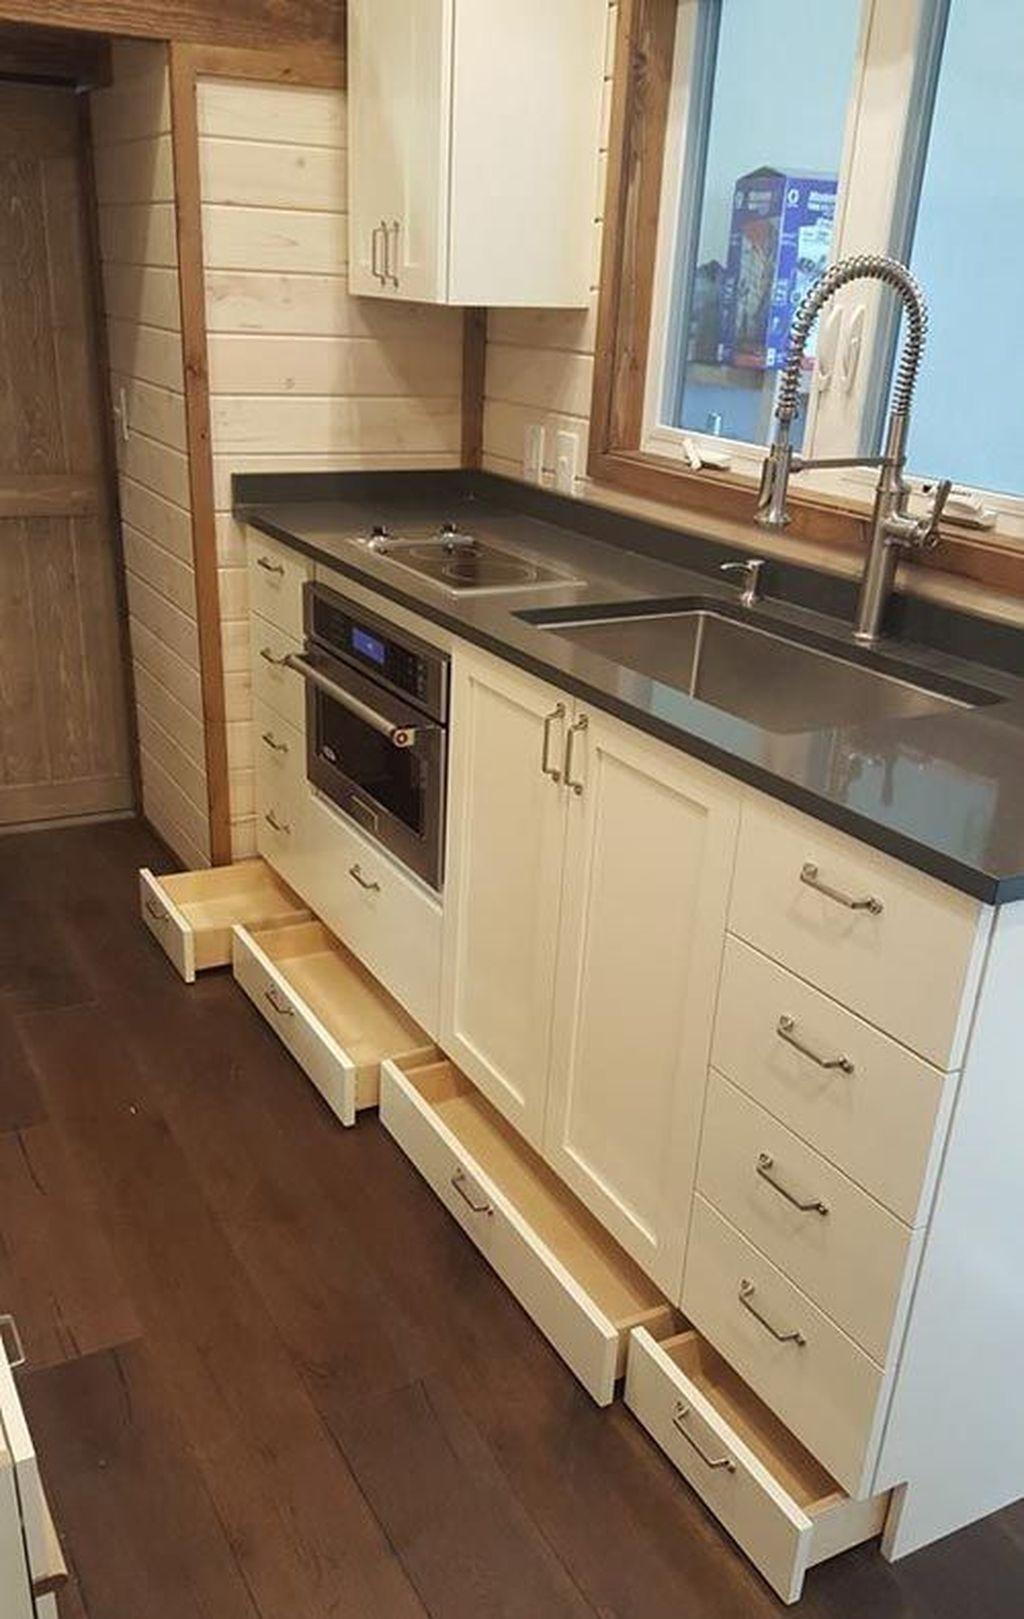 47 Easy Tiny House Kitchen Storage Ideas images